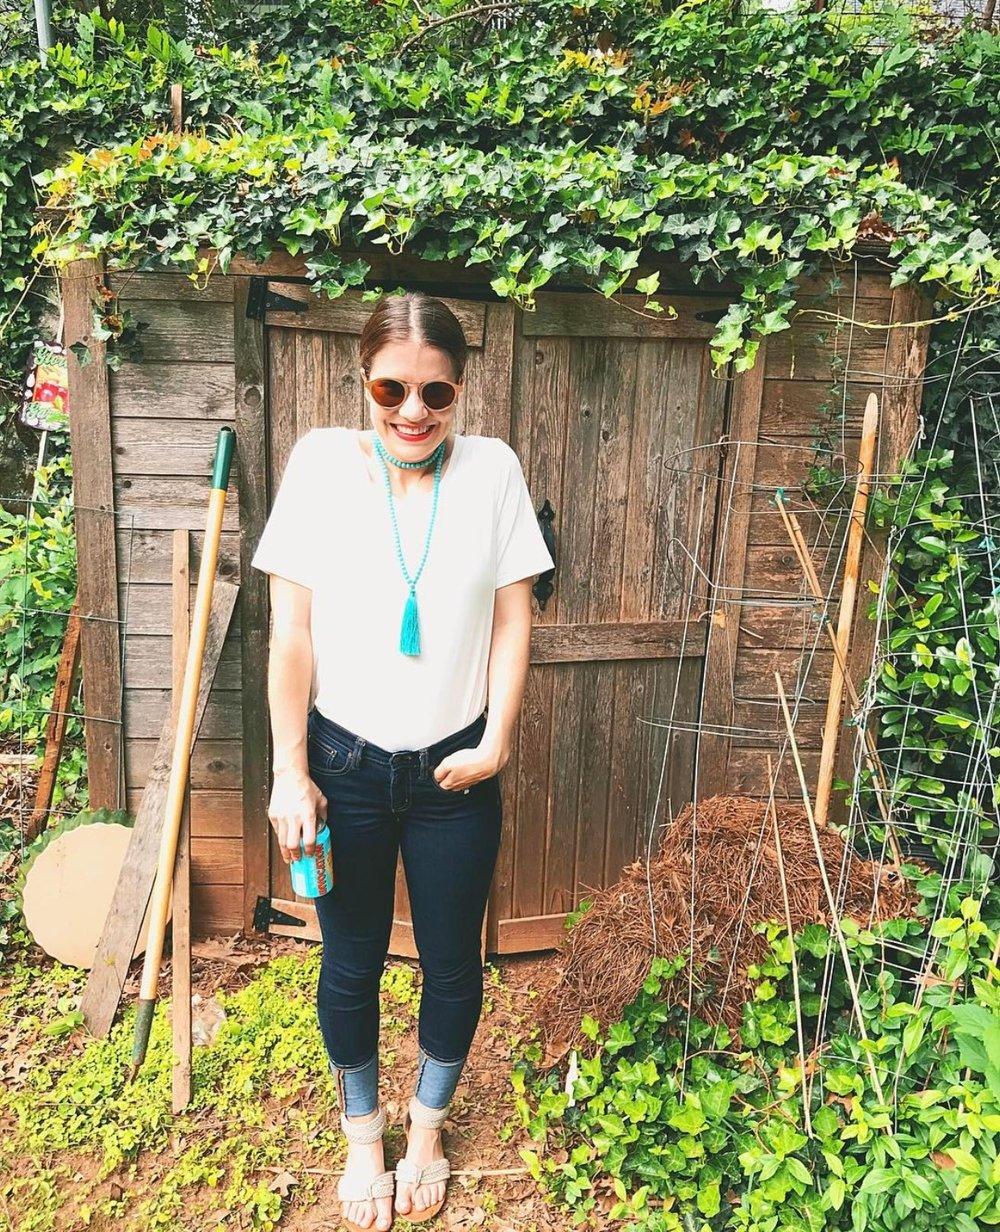 KristenGreenConsulting_Testimonial_SarahCarlson_GoodForGoodnessSake